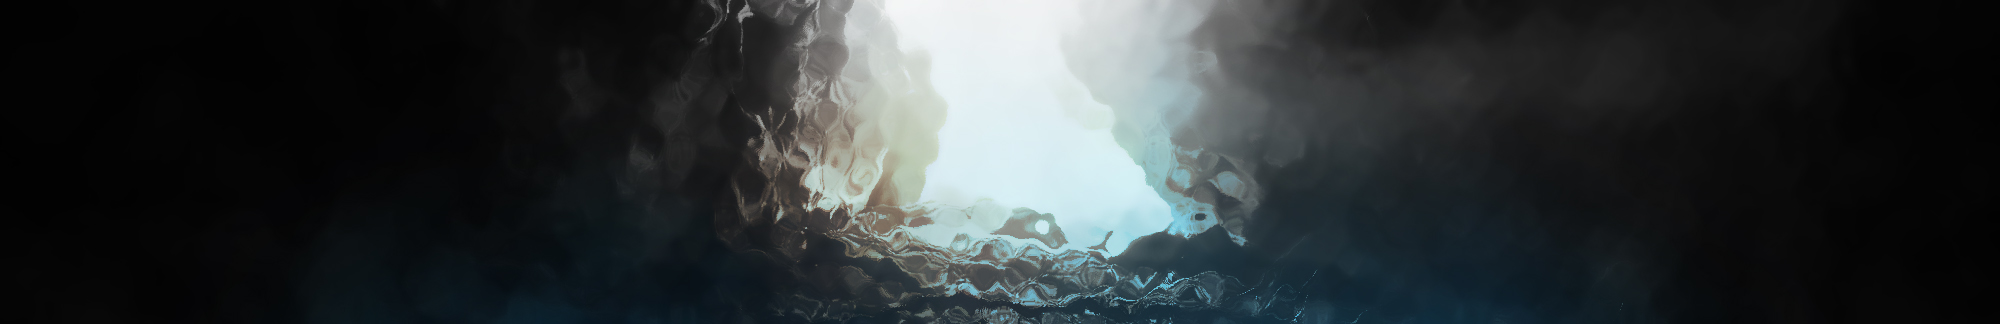 cave divider